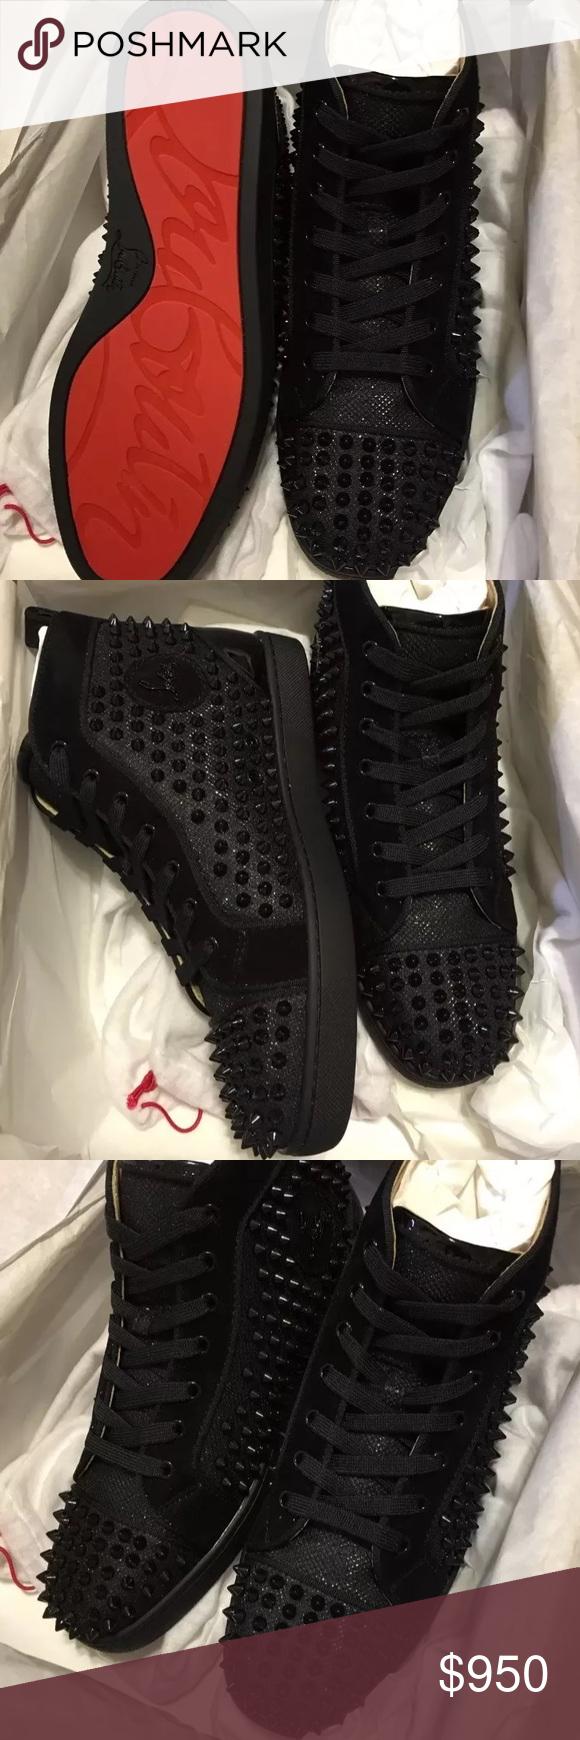 03778f6da4e Christian Louboutin Louis Orlato Spikes Mens Flats 100% Authentic Christian  Louboutin Shoes Sneakers